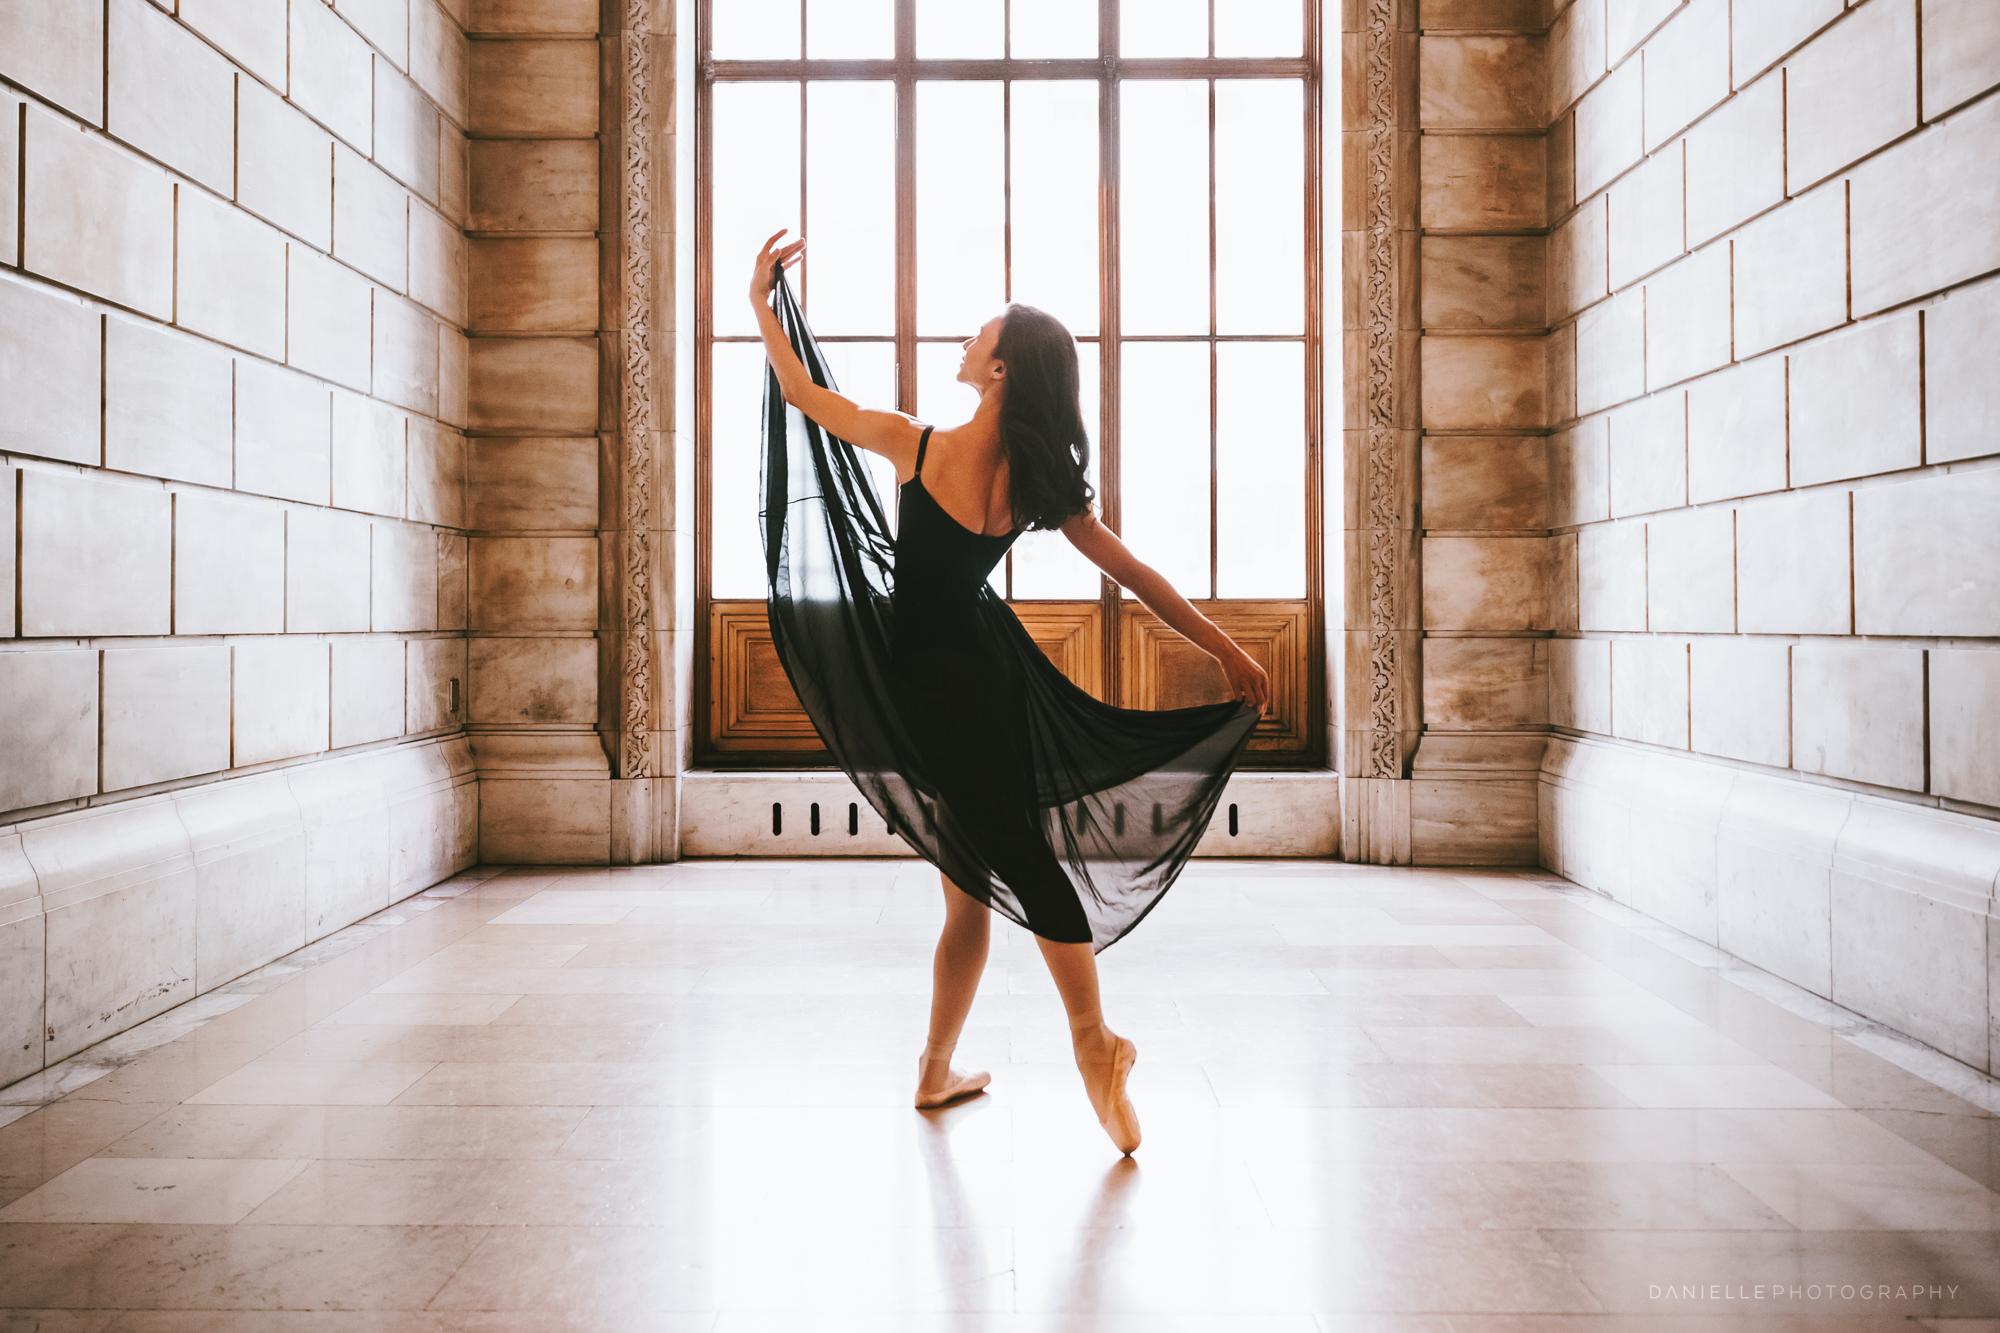 @DaniellePhotographySA_Ballerina_Photoshoot_NYPL-23-26.jpg